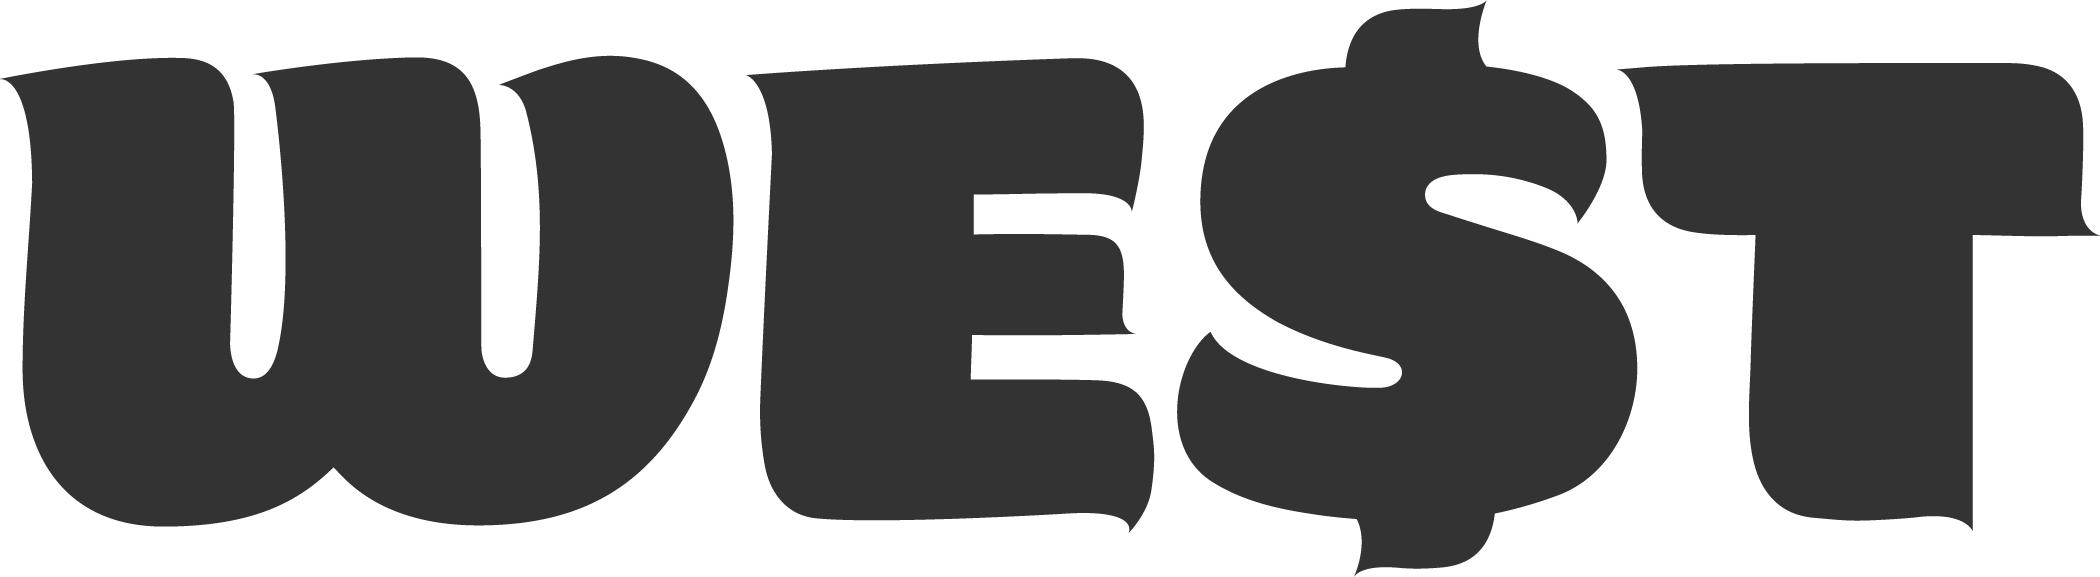 Asset 5.png